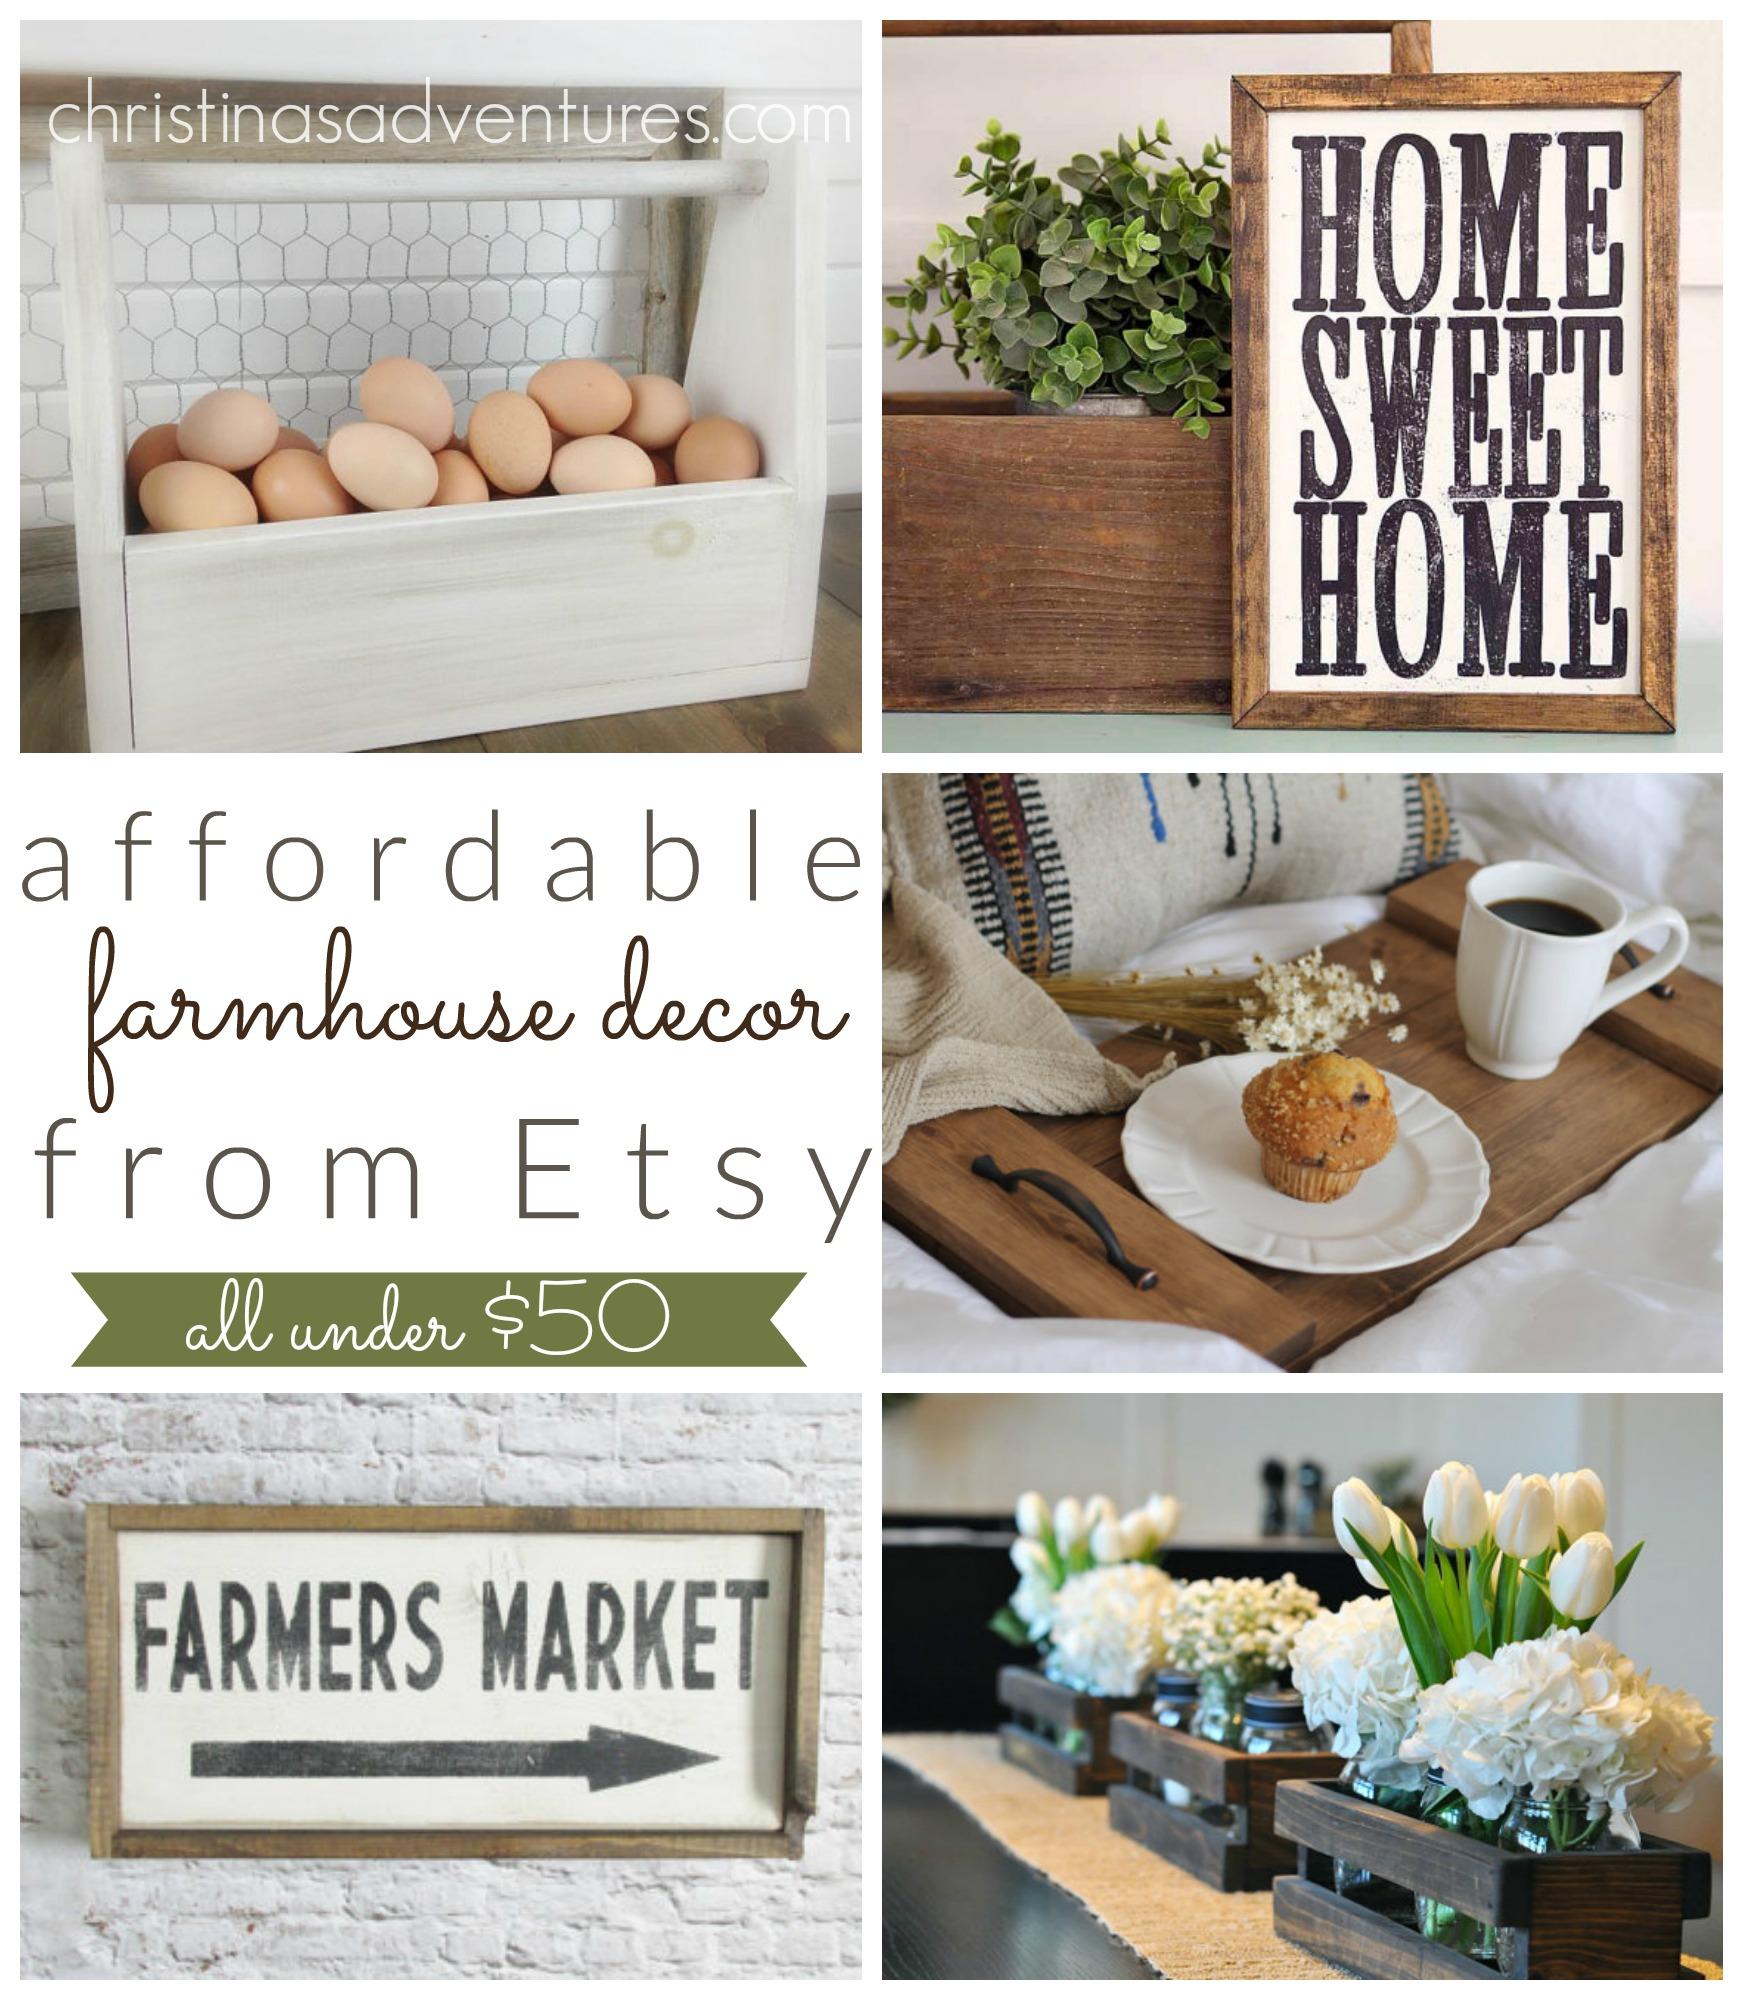 Affordable Farmhouse Decor On Etsy All Under 50